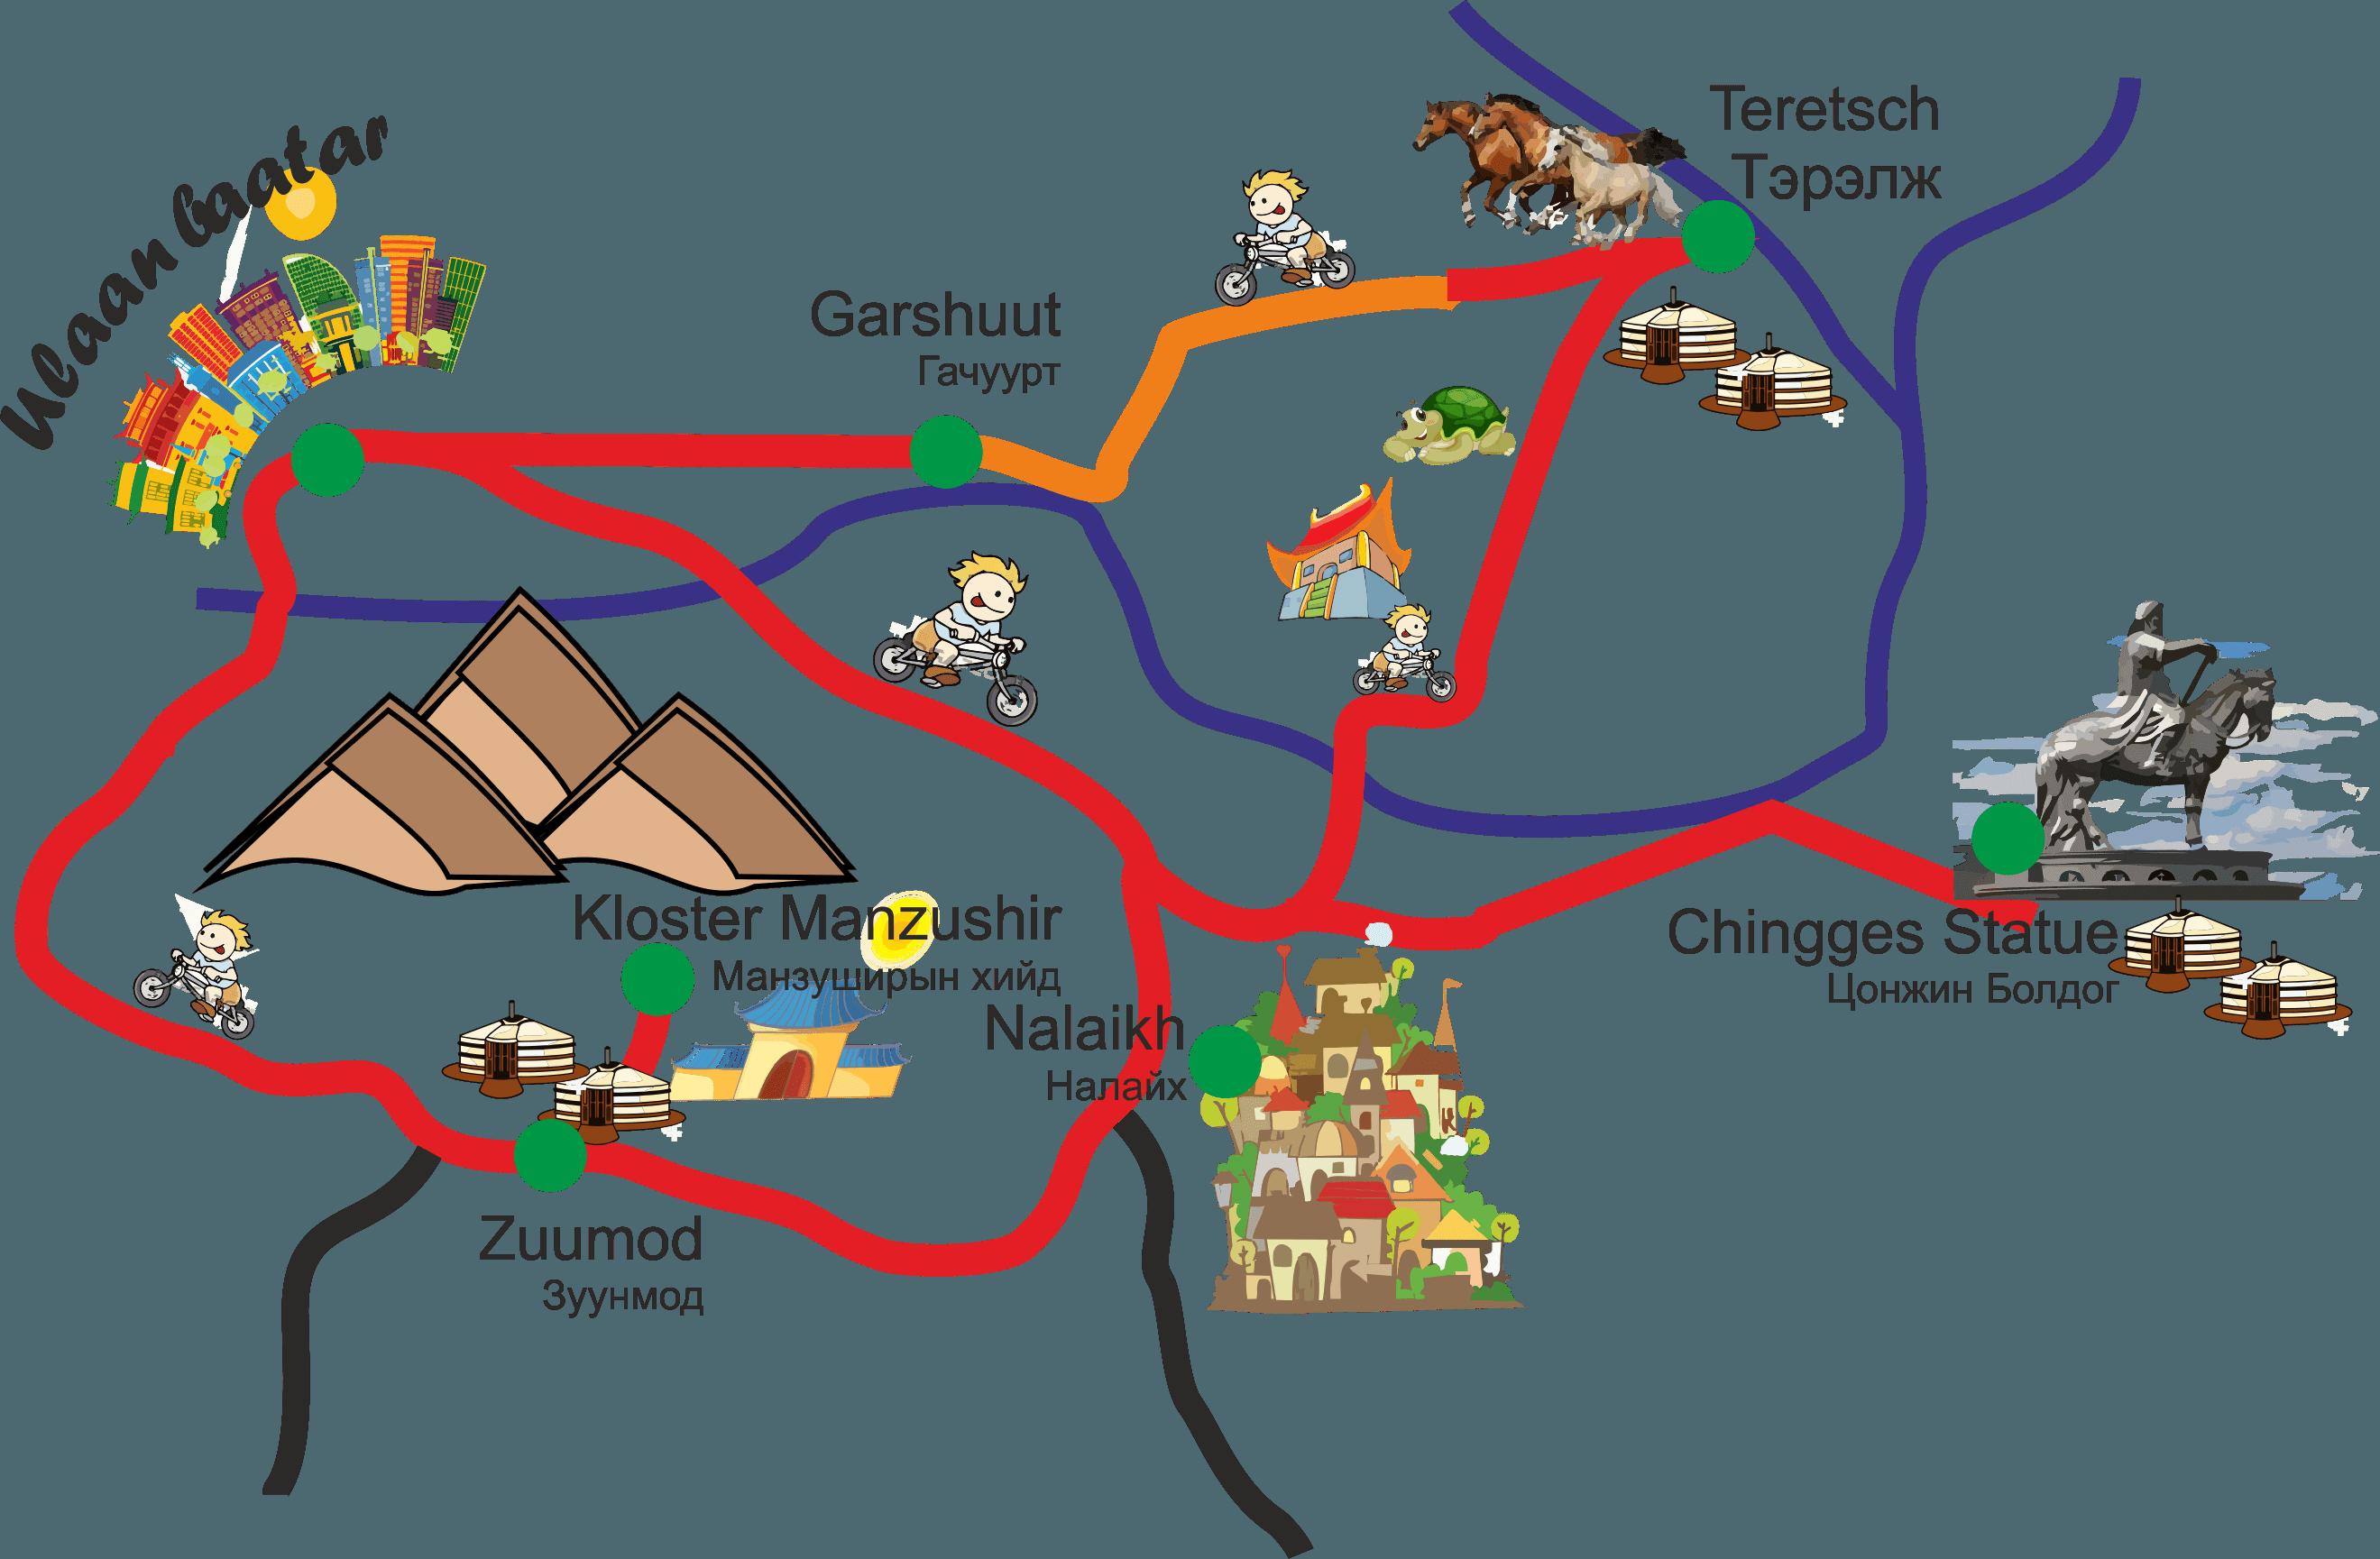 Karte Tereltsch Loop